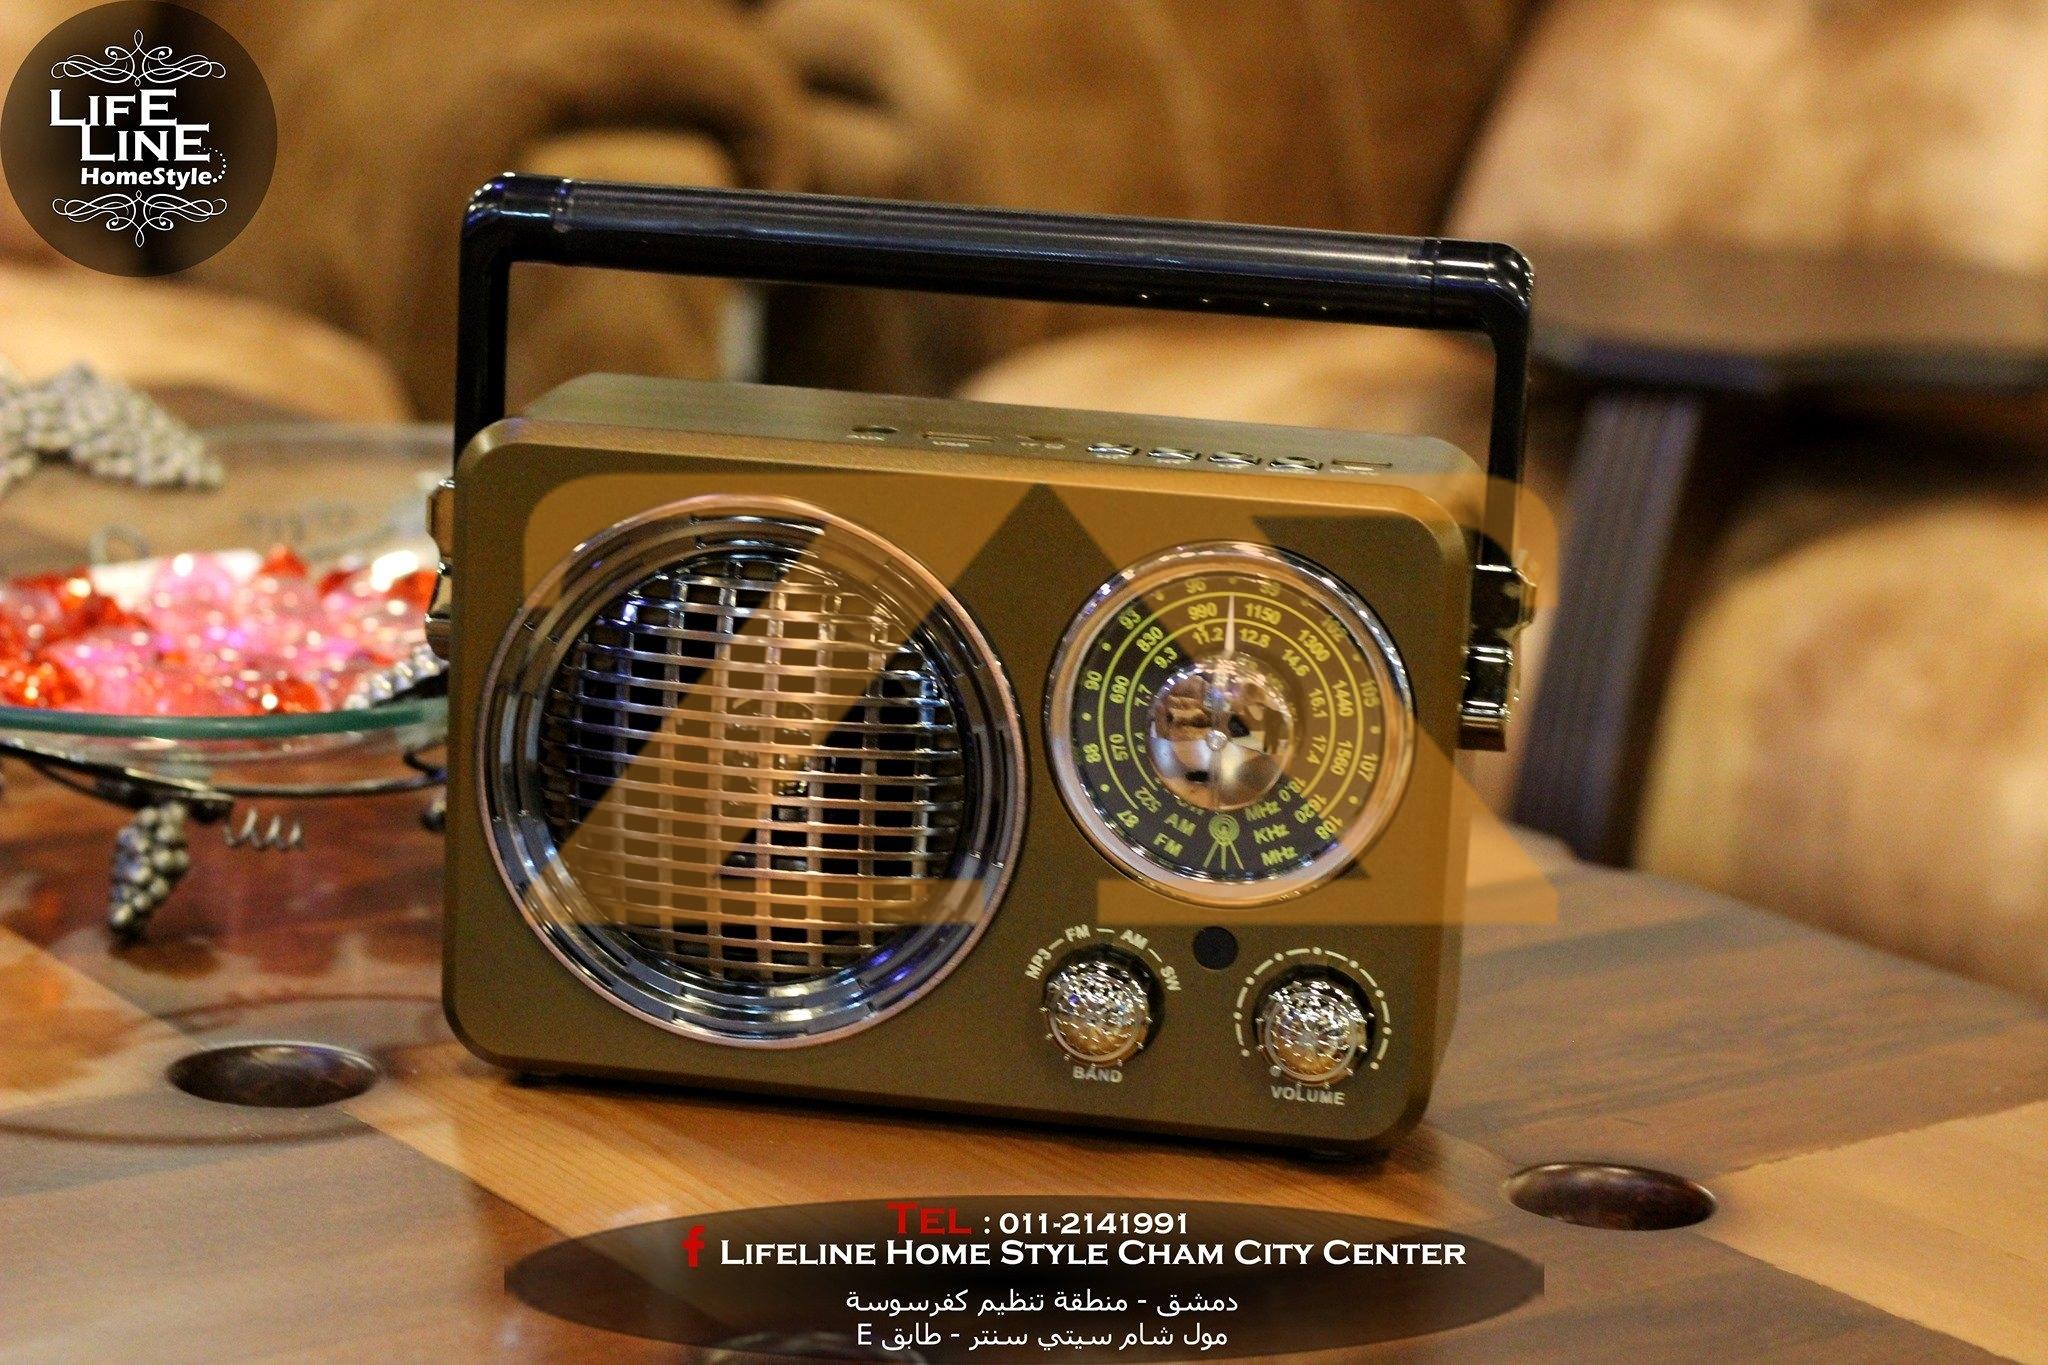 راديو بموديل أنتيكا